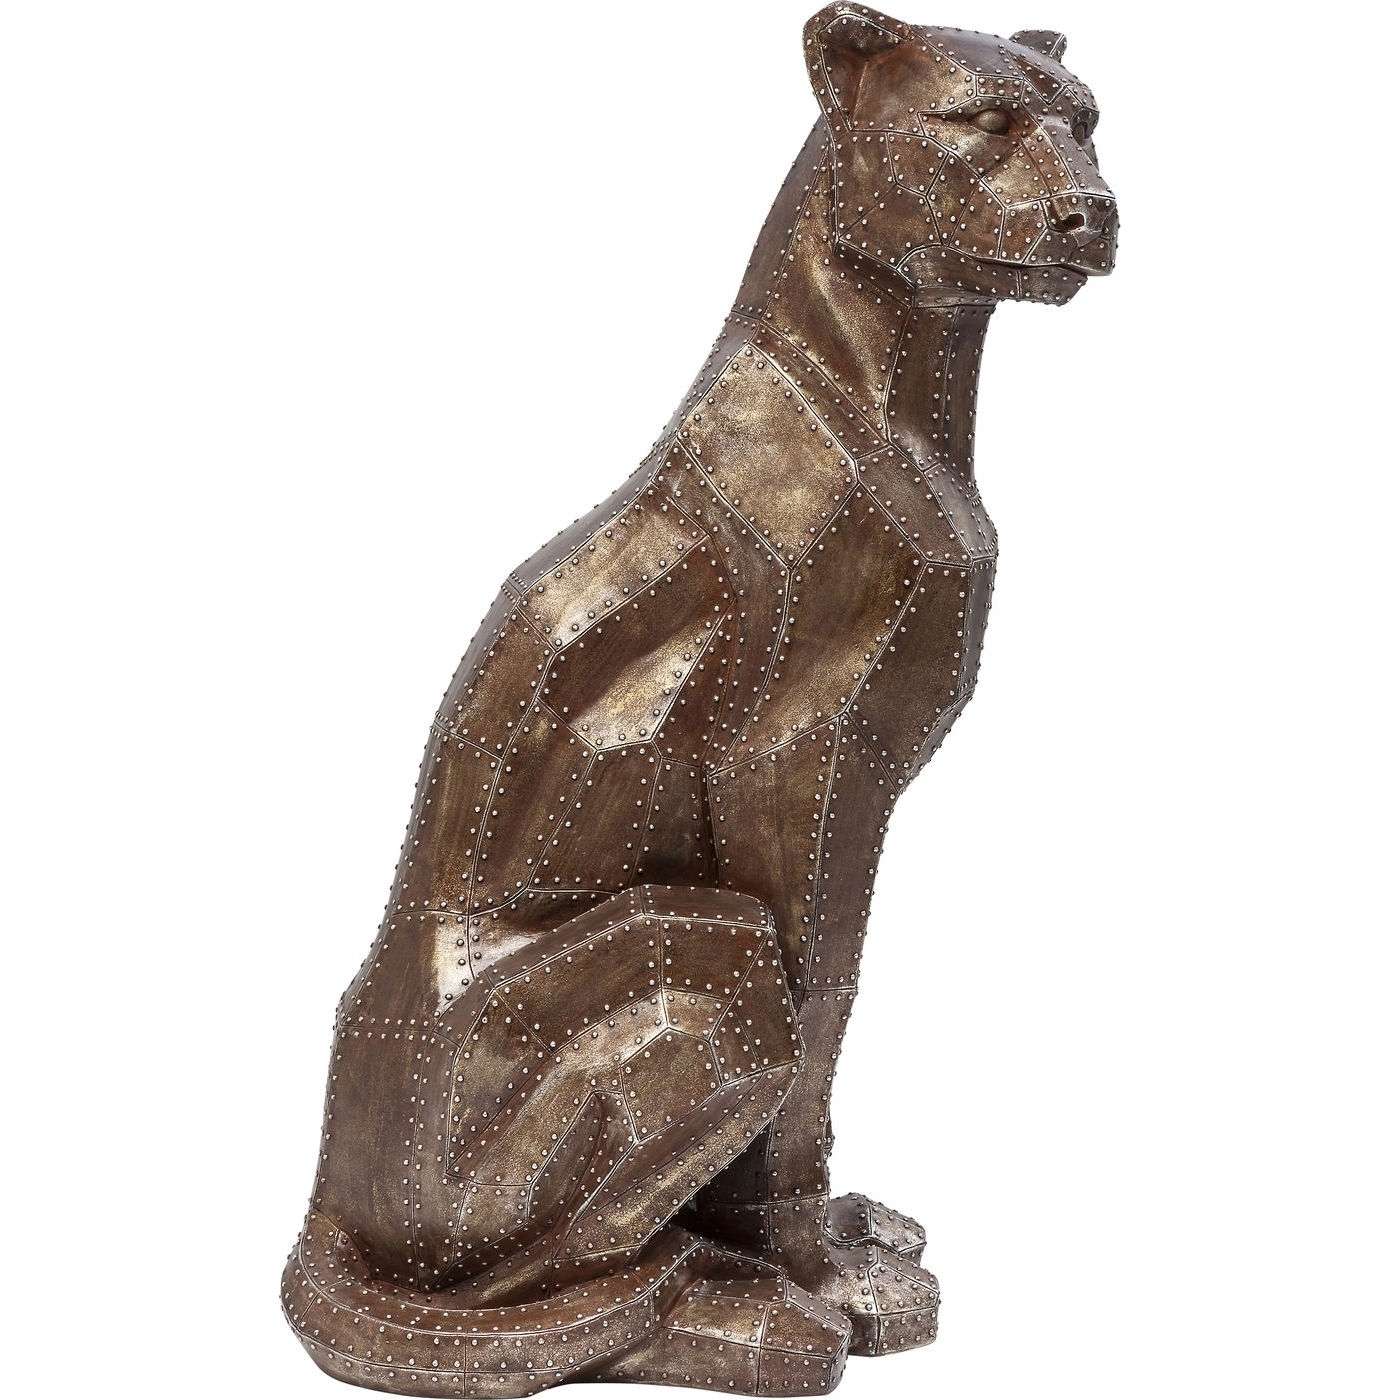 Deko Figur Sitting Cat Rivet Kupfer